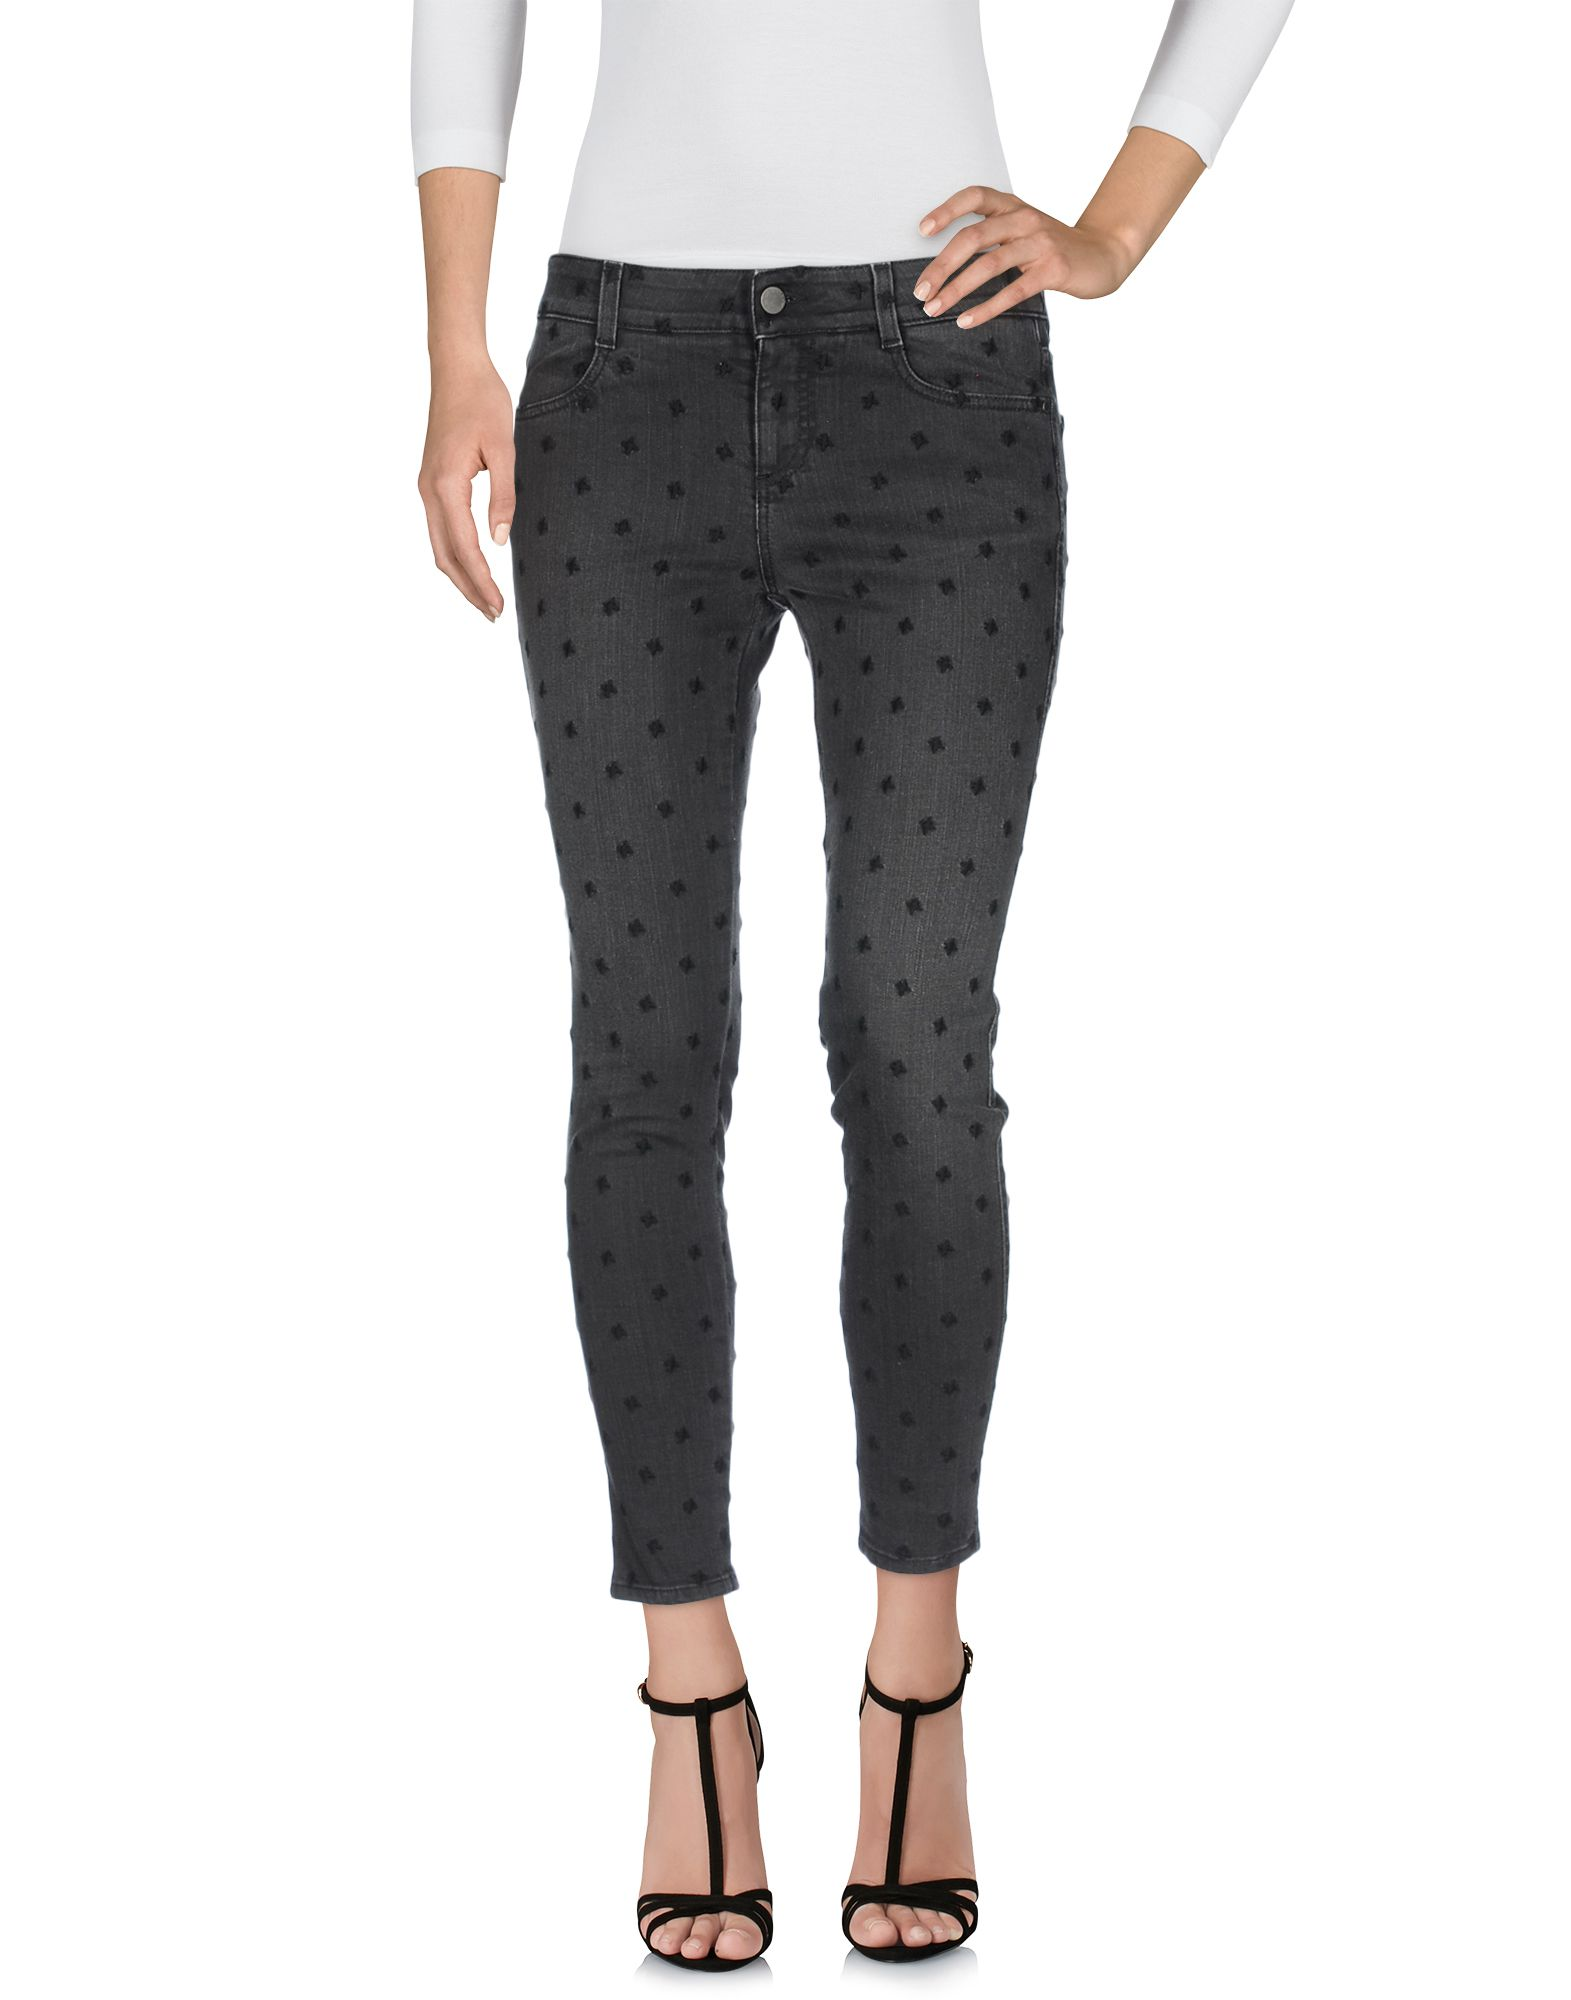 Pantaloni Jeans Stella Mccartney Donna - Acquista online su aadkTu